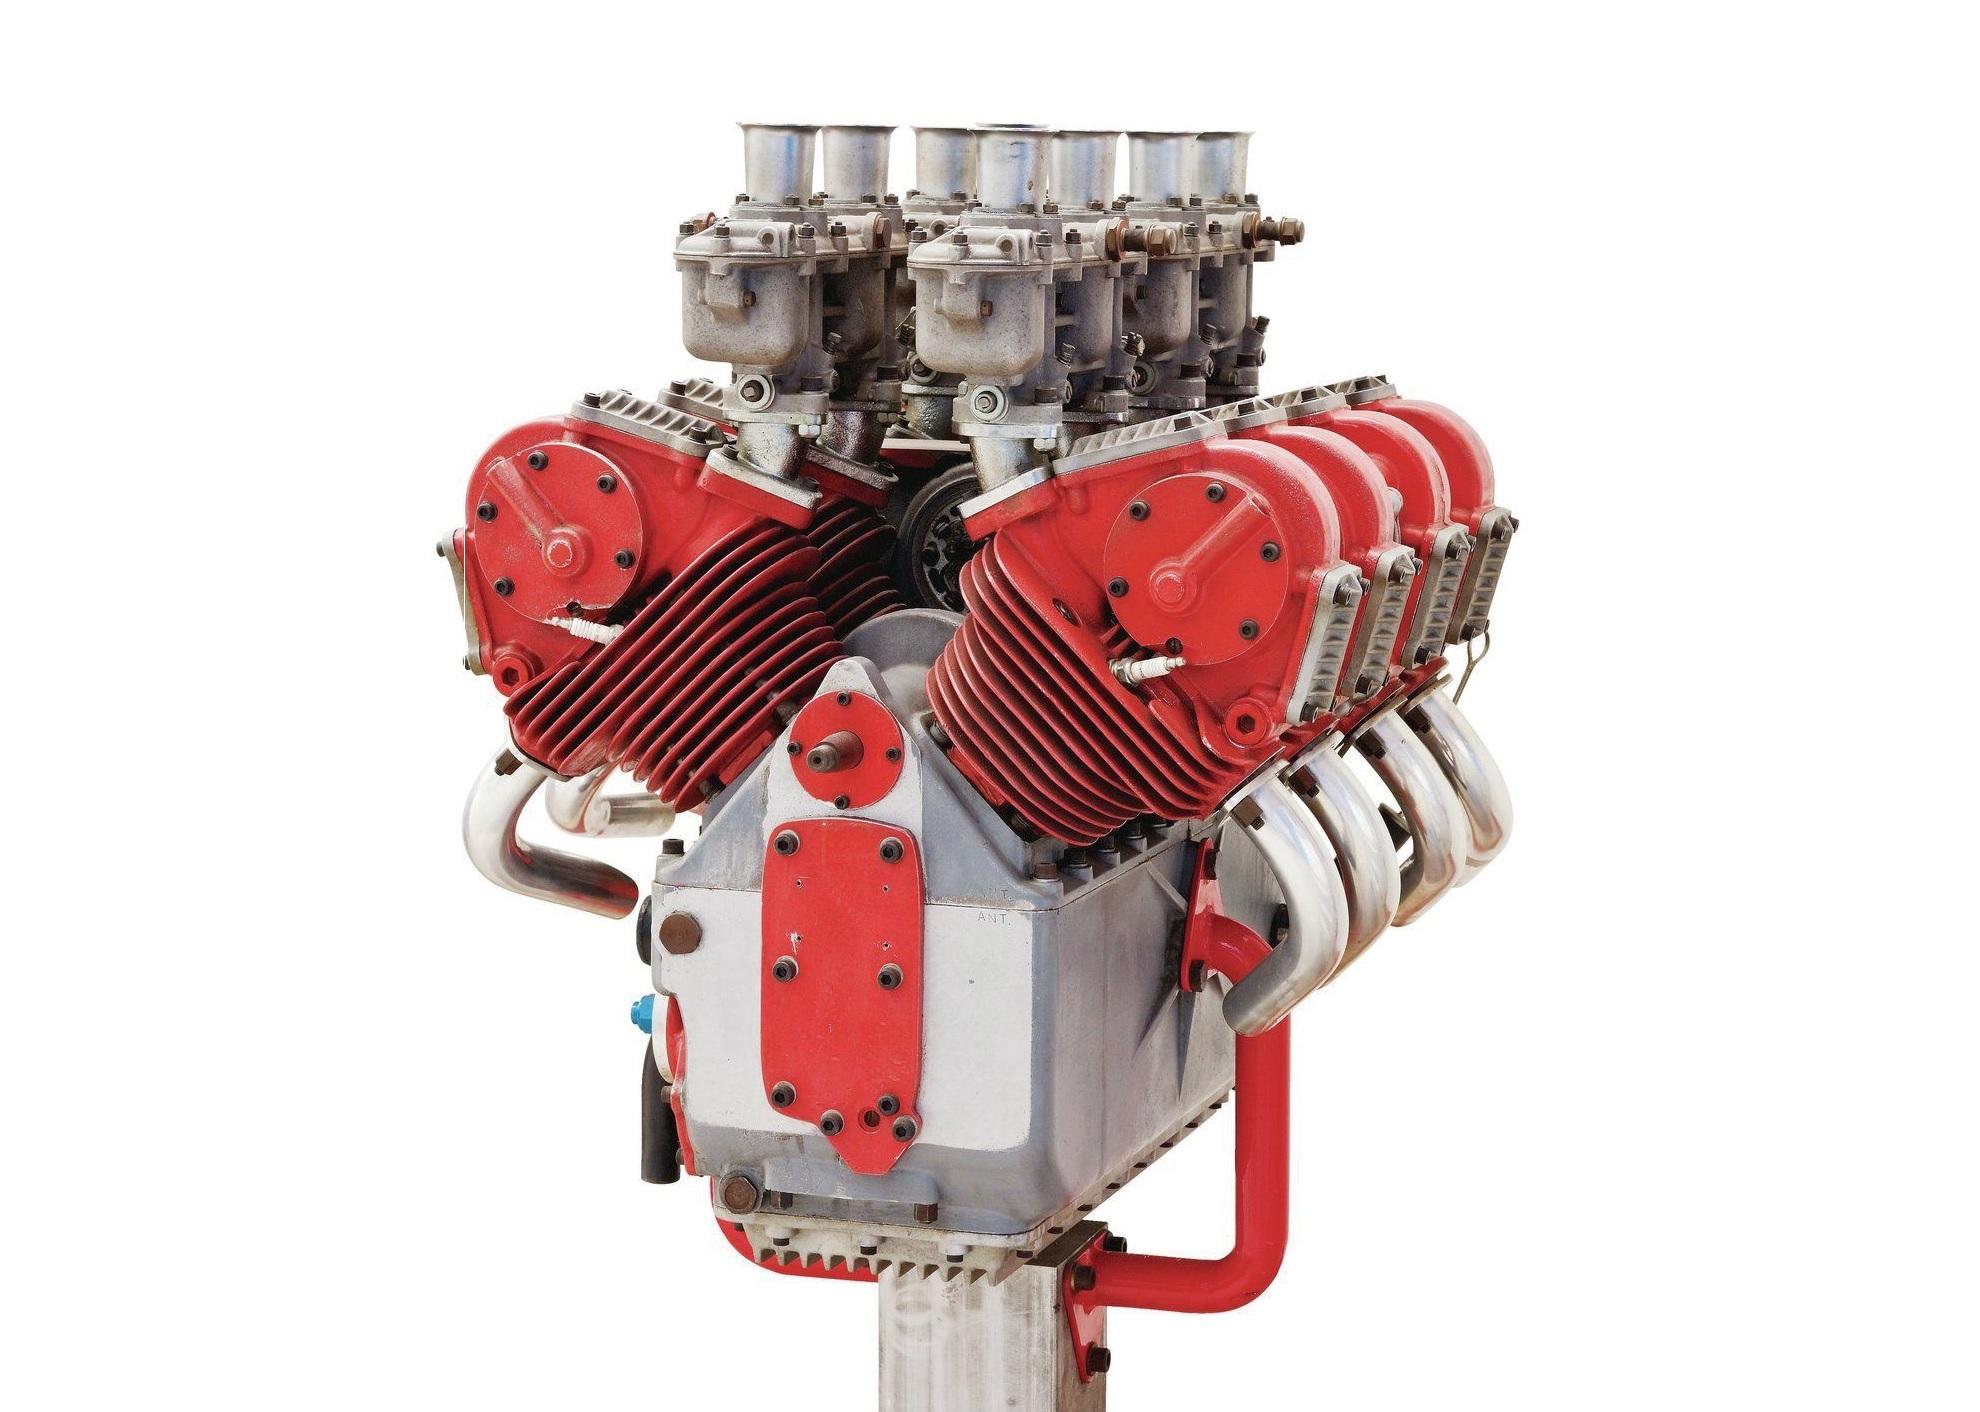 DUCATI 在1950年代製造的V型八汽缸原型引擎,是為OSCA 車廠而設計,這間公司當時隸屬在MASERATI 旗下